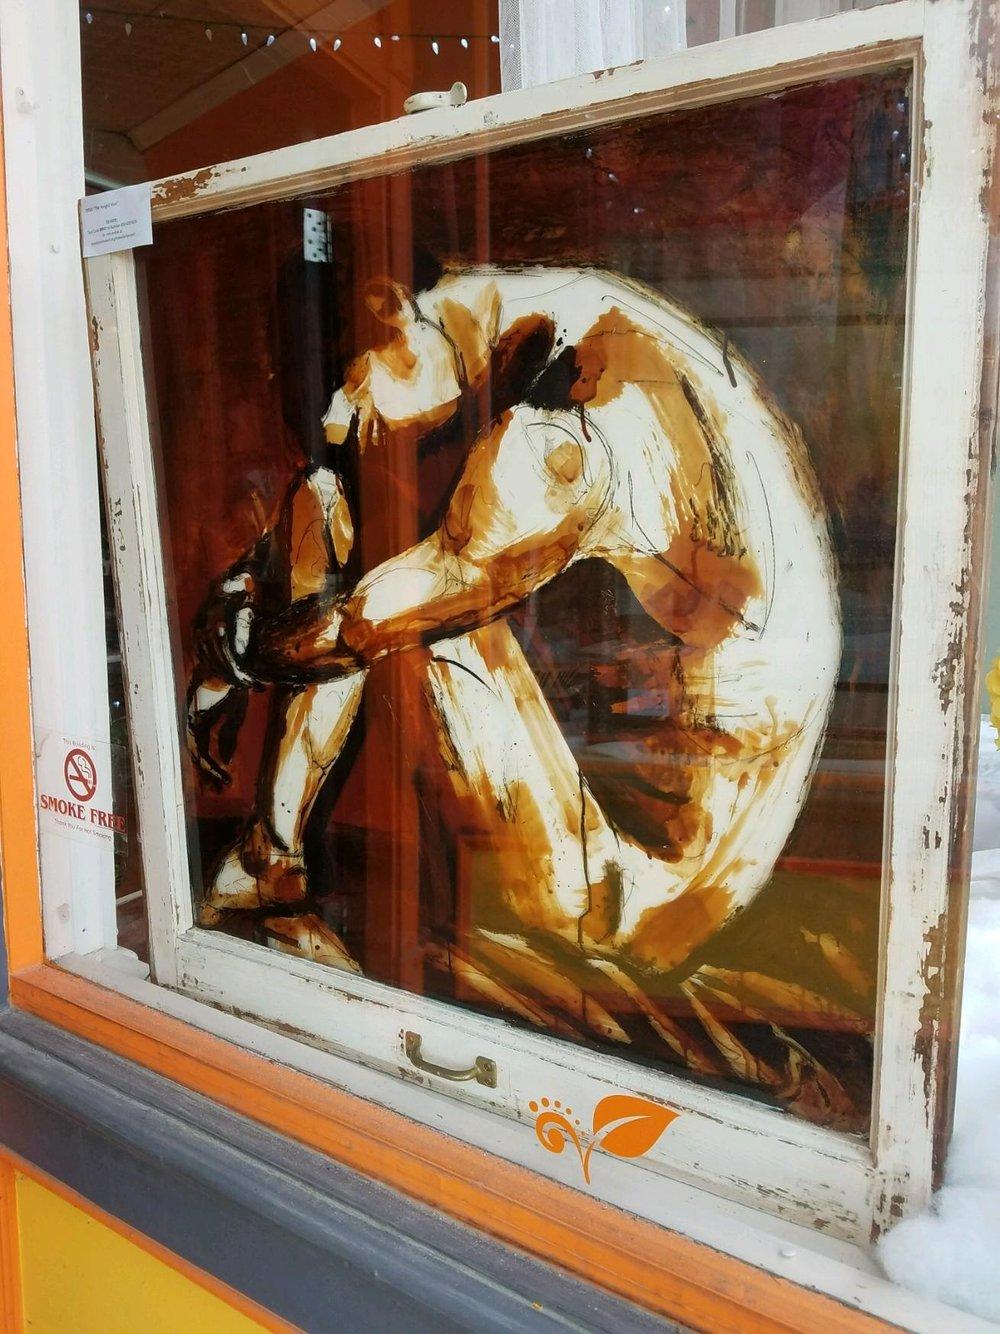 Hanged man art at Kokopellis.jpg